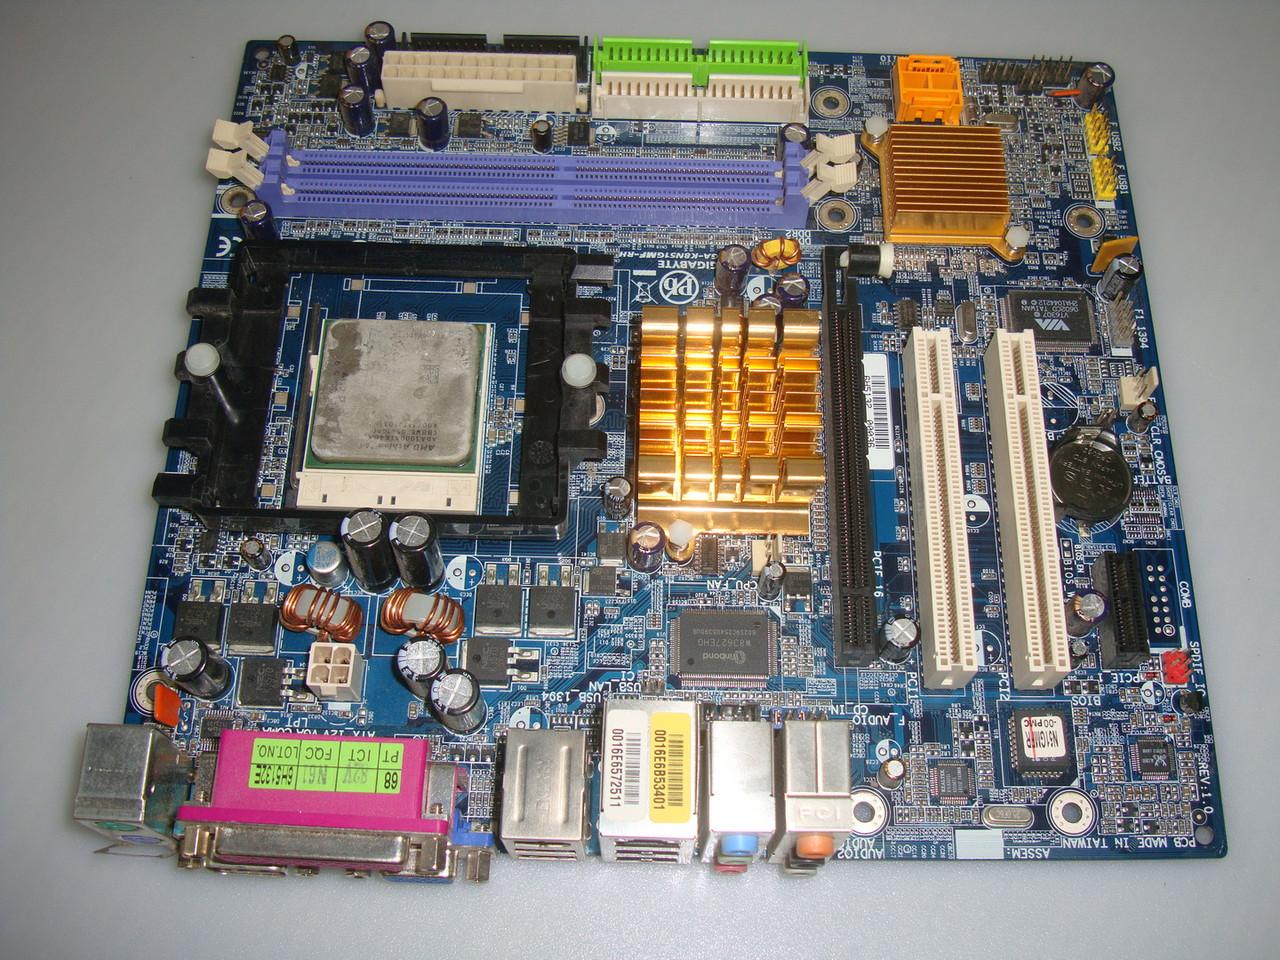 Материнская плата GIGABYTE GA-K8N51GMF-RH (Socket 754, DDR DIMM)